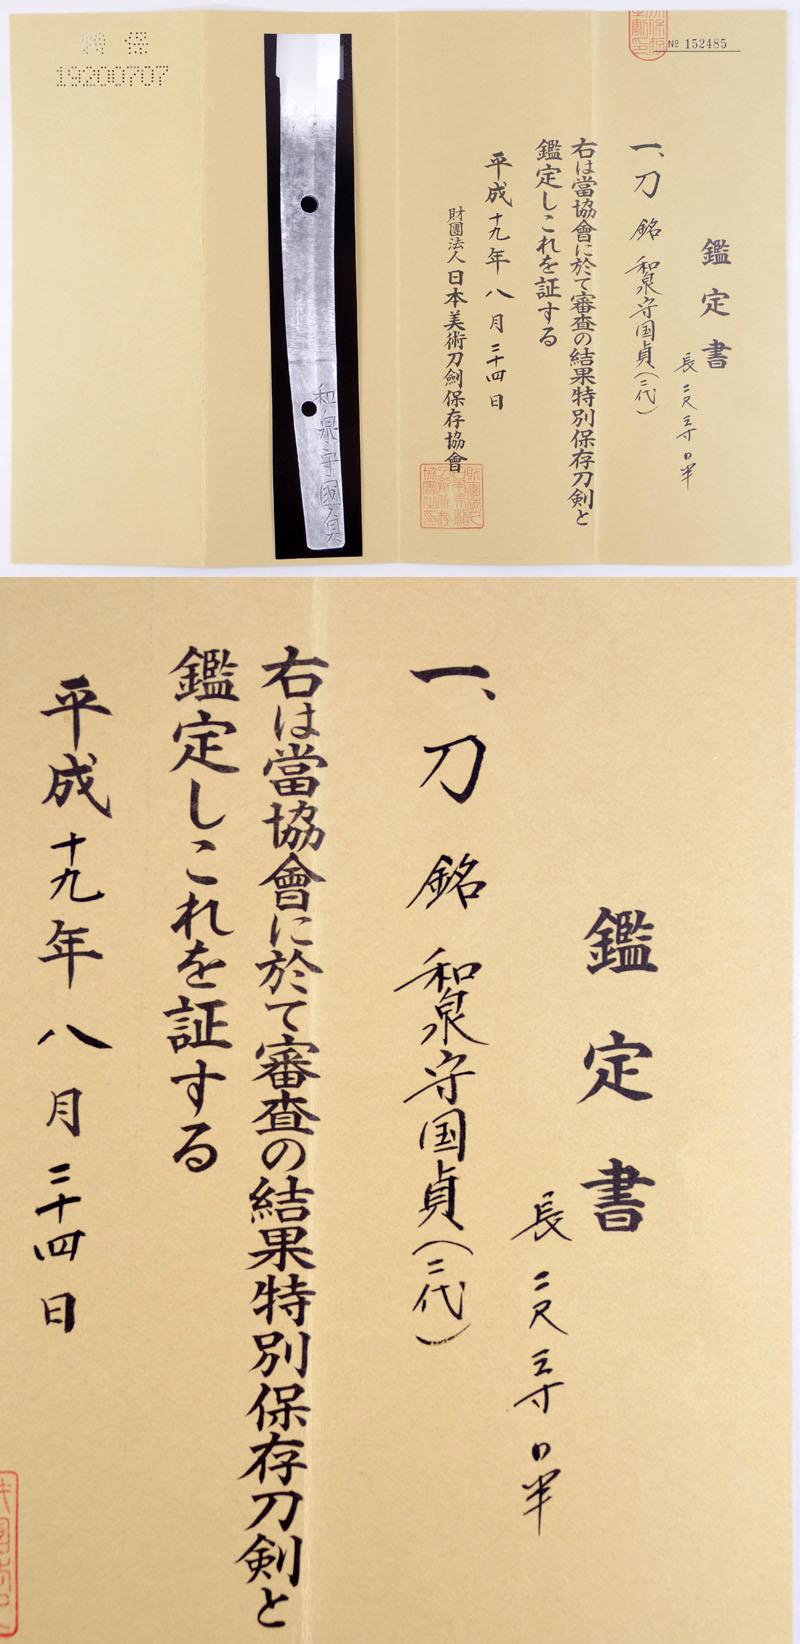 刀 和泉守国貞(二代) Picture of Certificate